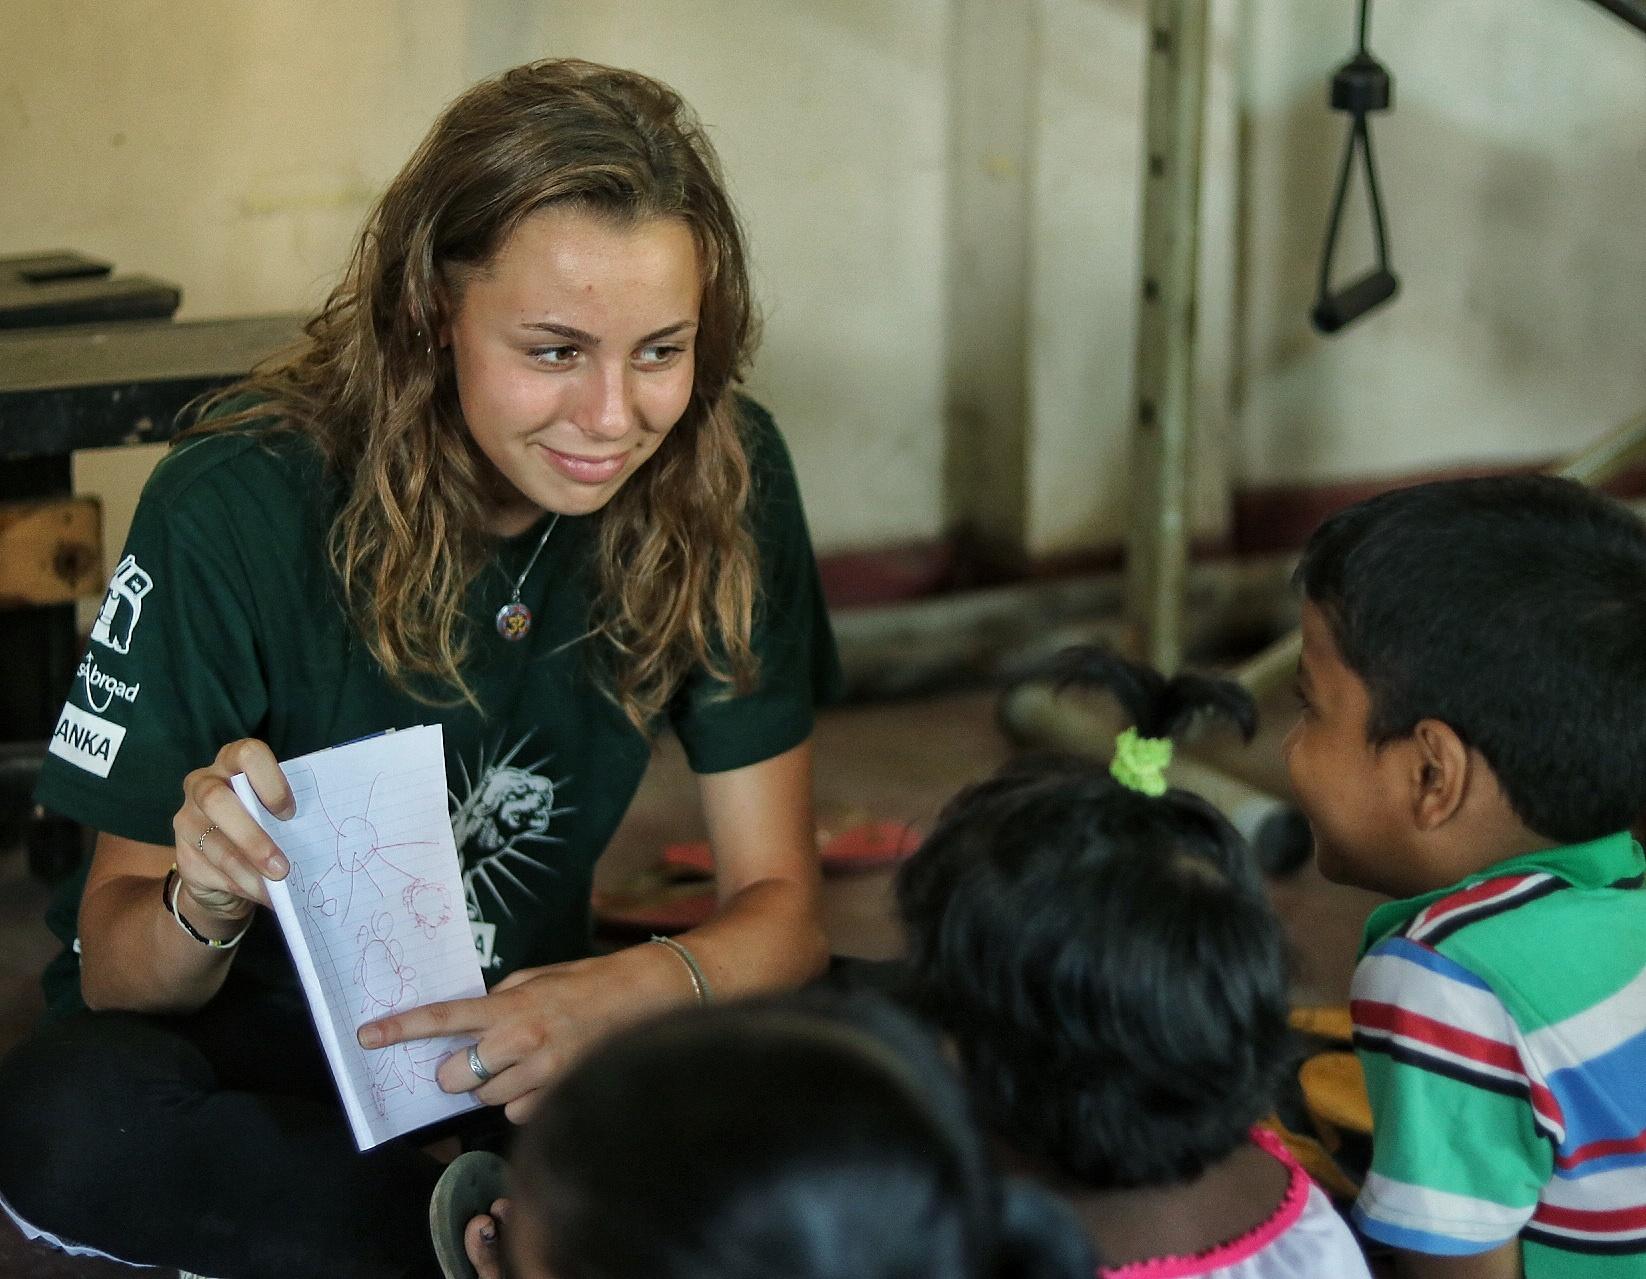 Gap Year Program - Projects Abroad: Gap Year Volunteering Abroad  3